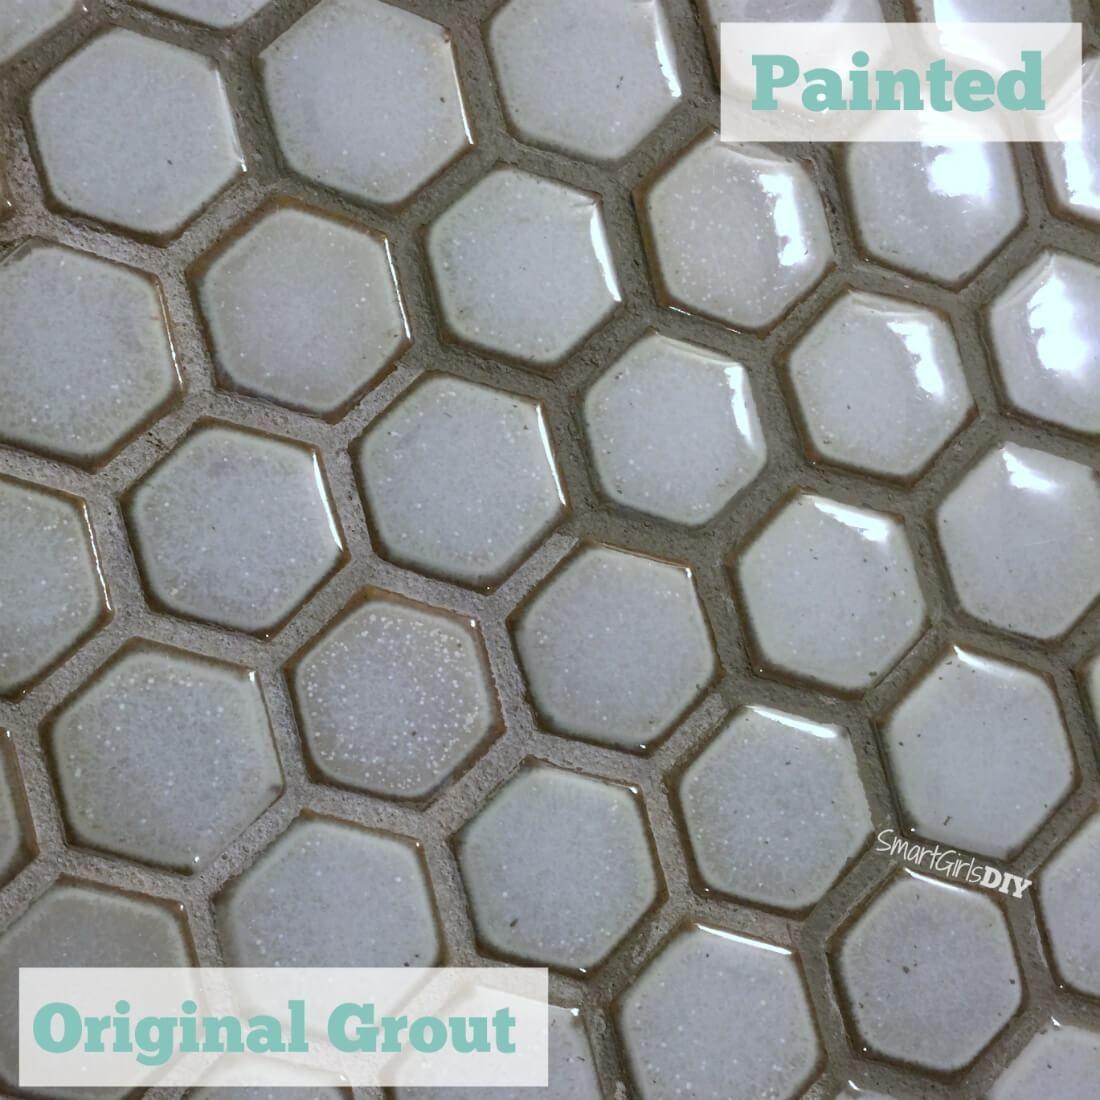 Painting hexagon mosaic floor tile because i hated the grout color painting hexagon mosaic floor tile because i hated the grout color dailygadgetfo Choice Image